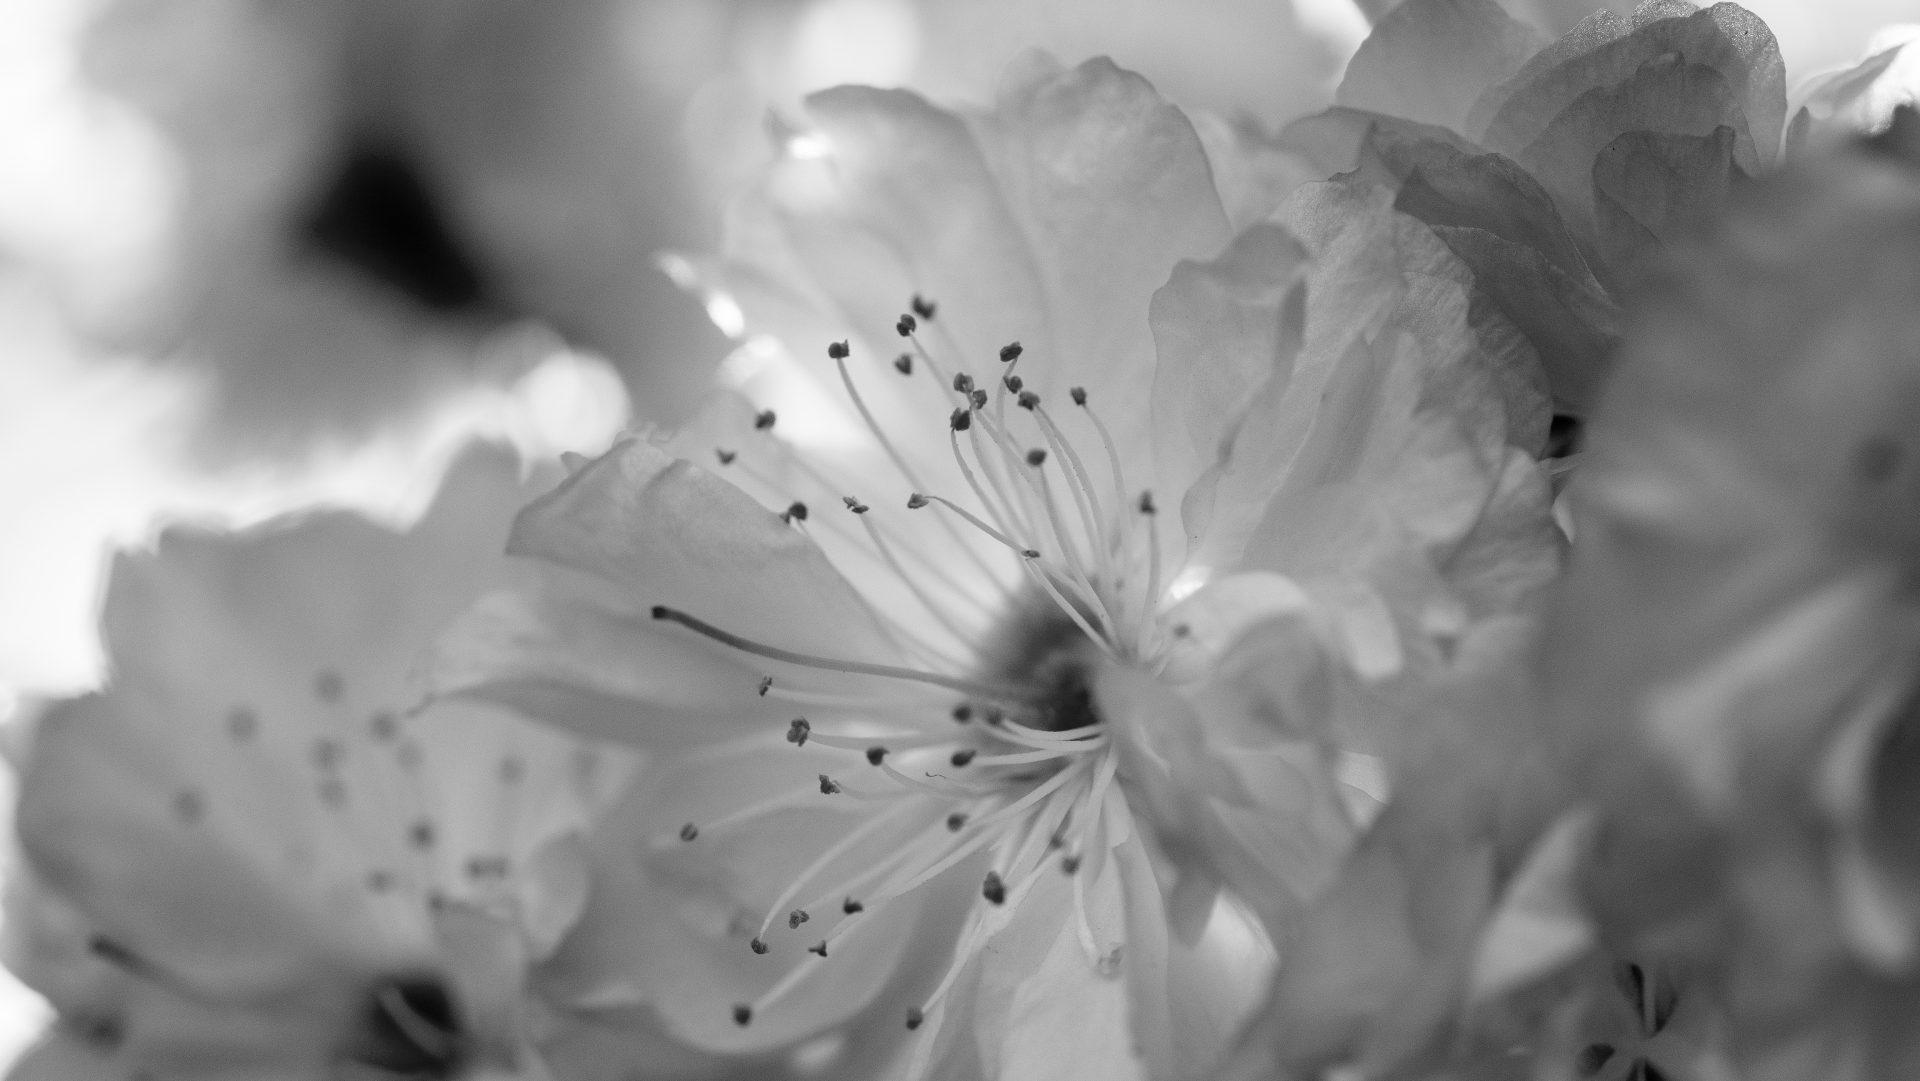 Nettypic photography